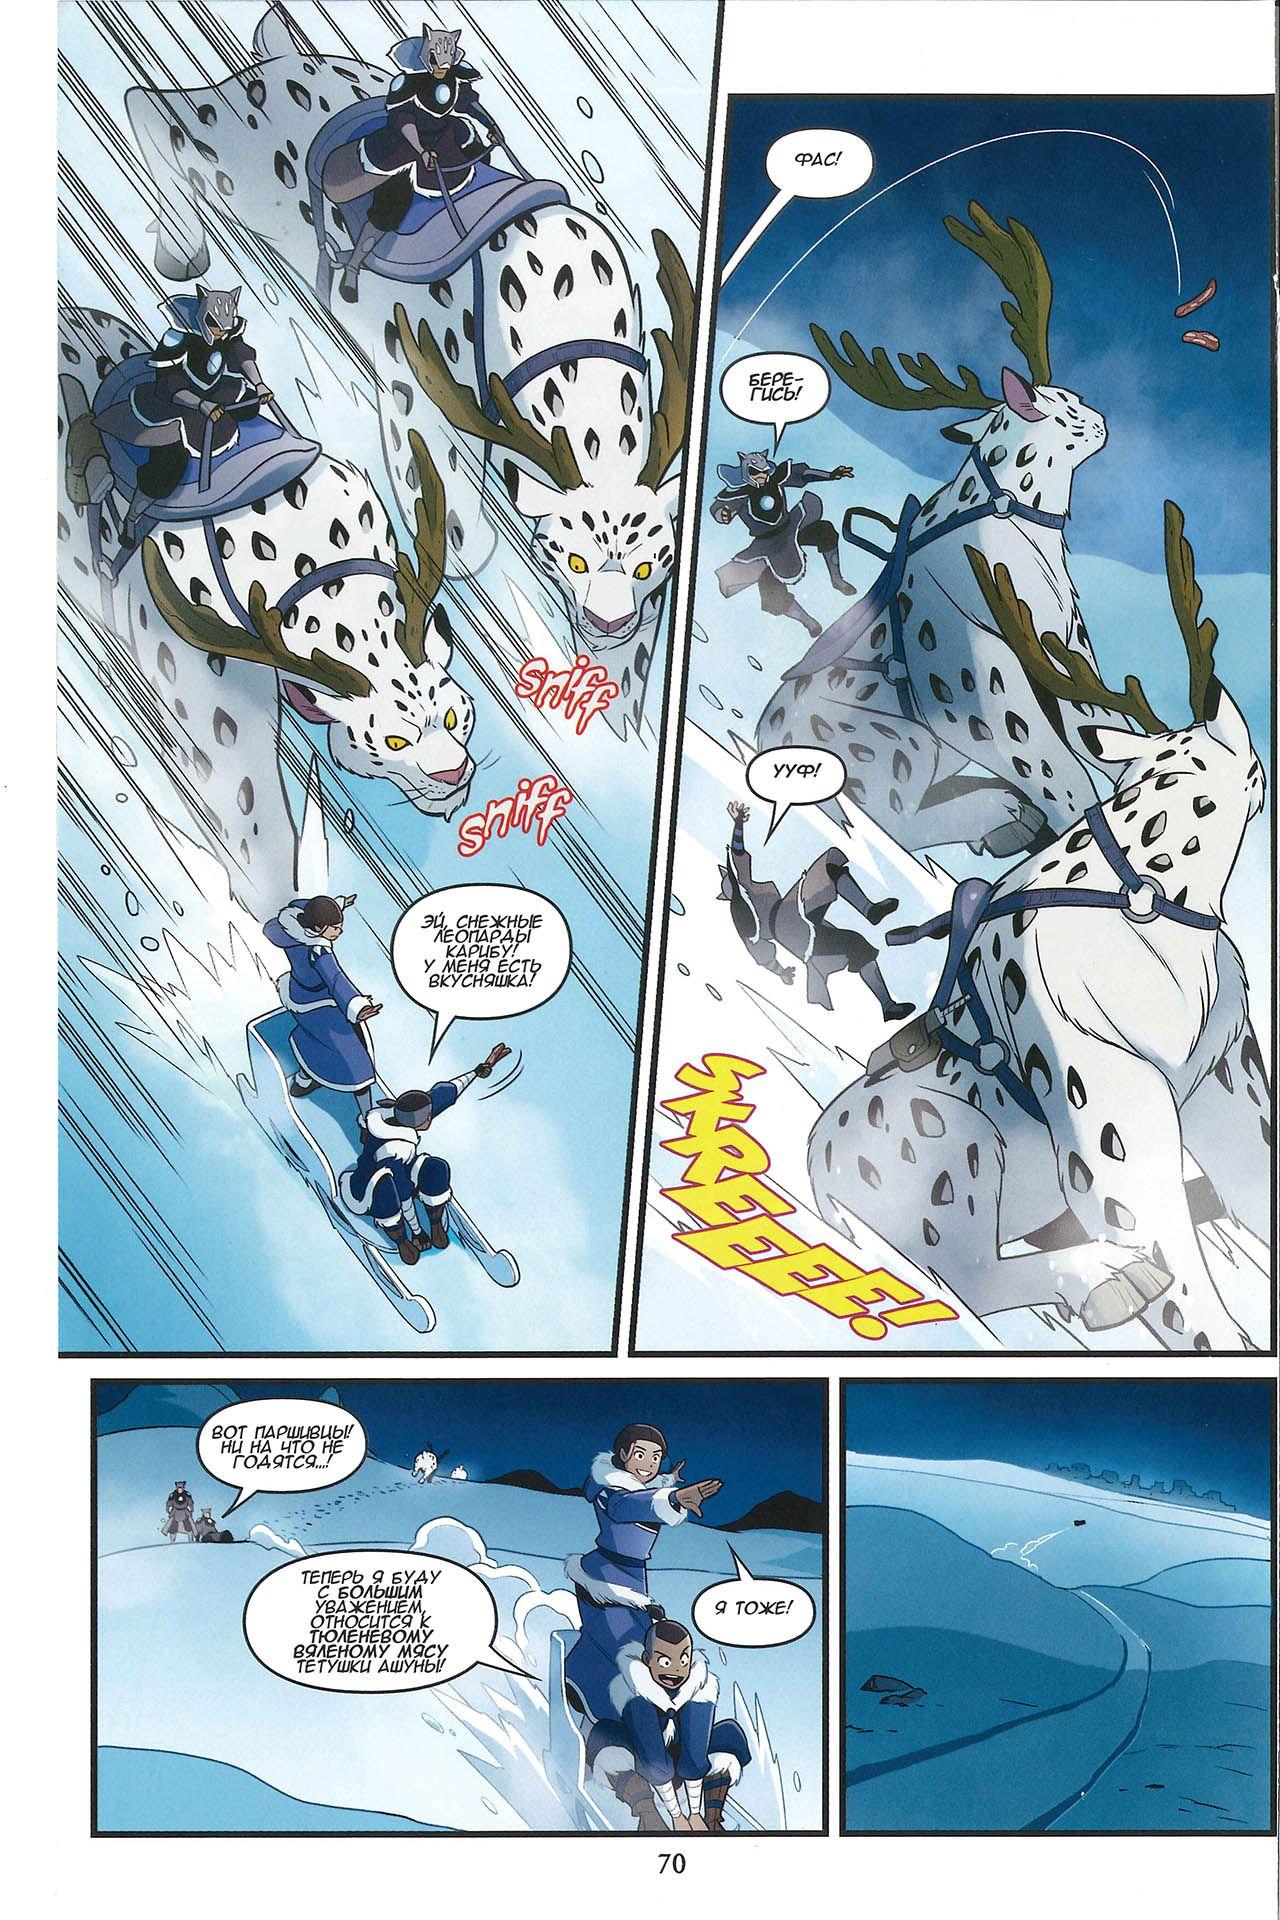 Комиксы Онлайн - Аватар: Легенда об Аанге - Север и Юг - # 1 - Страница №70 - Avatar: The Last Airbender - North and South - # 1